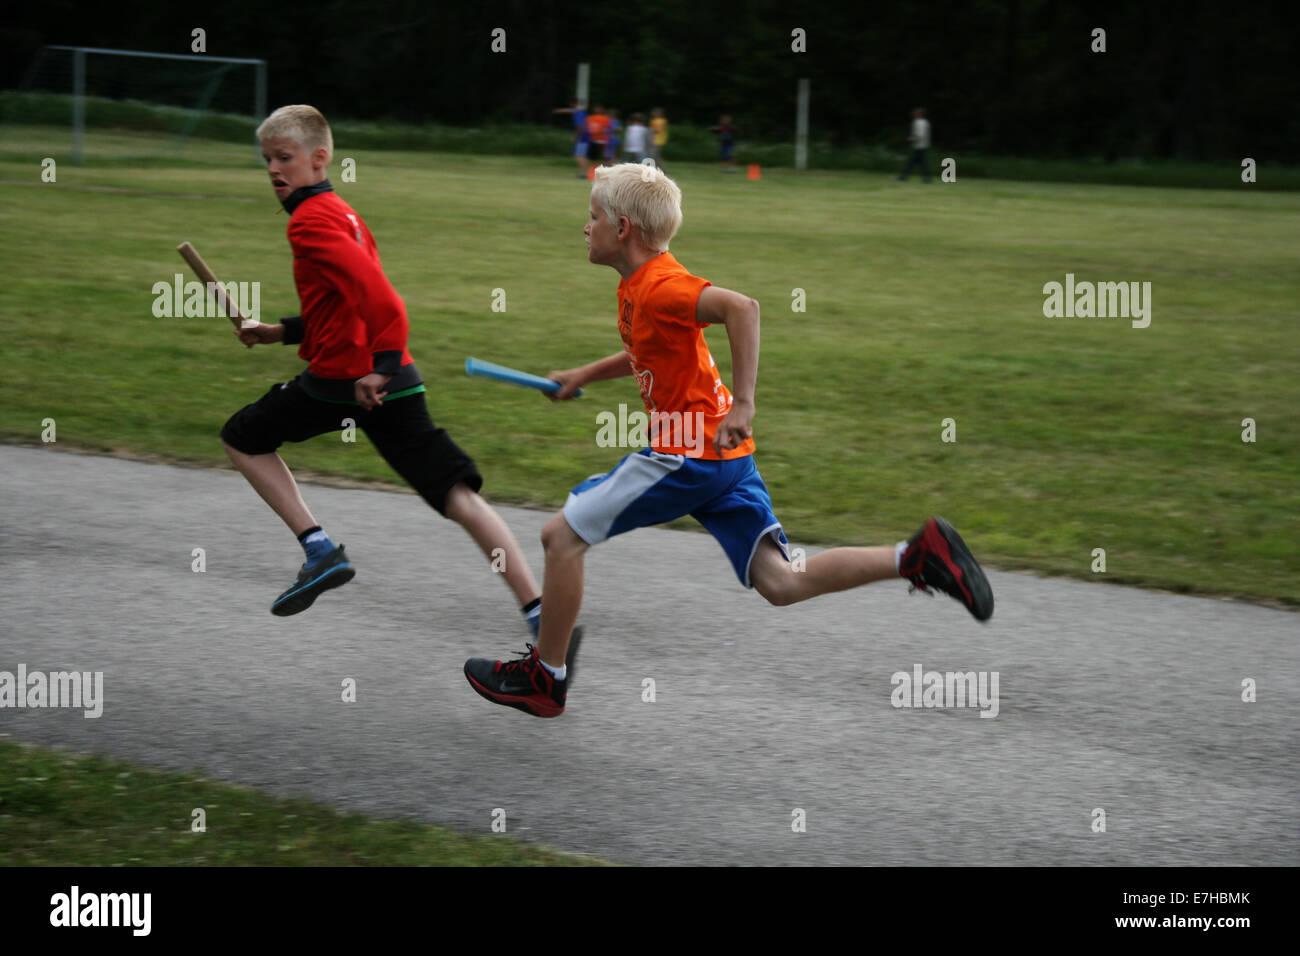 Relay race - Stock Image